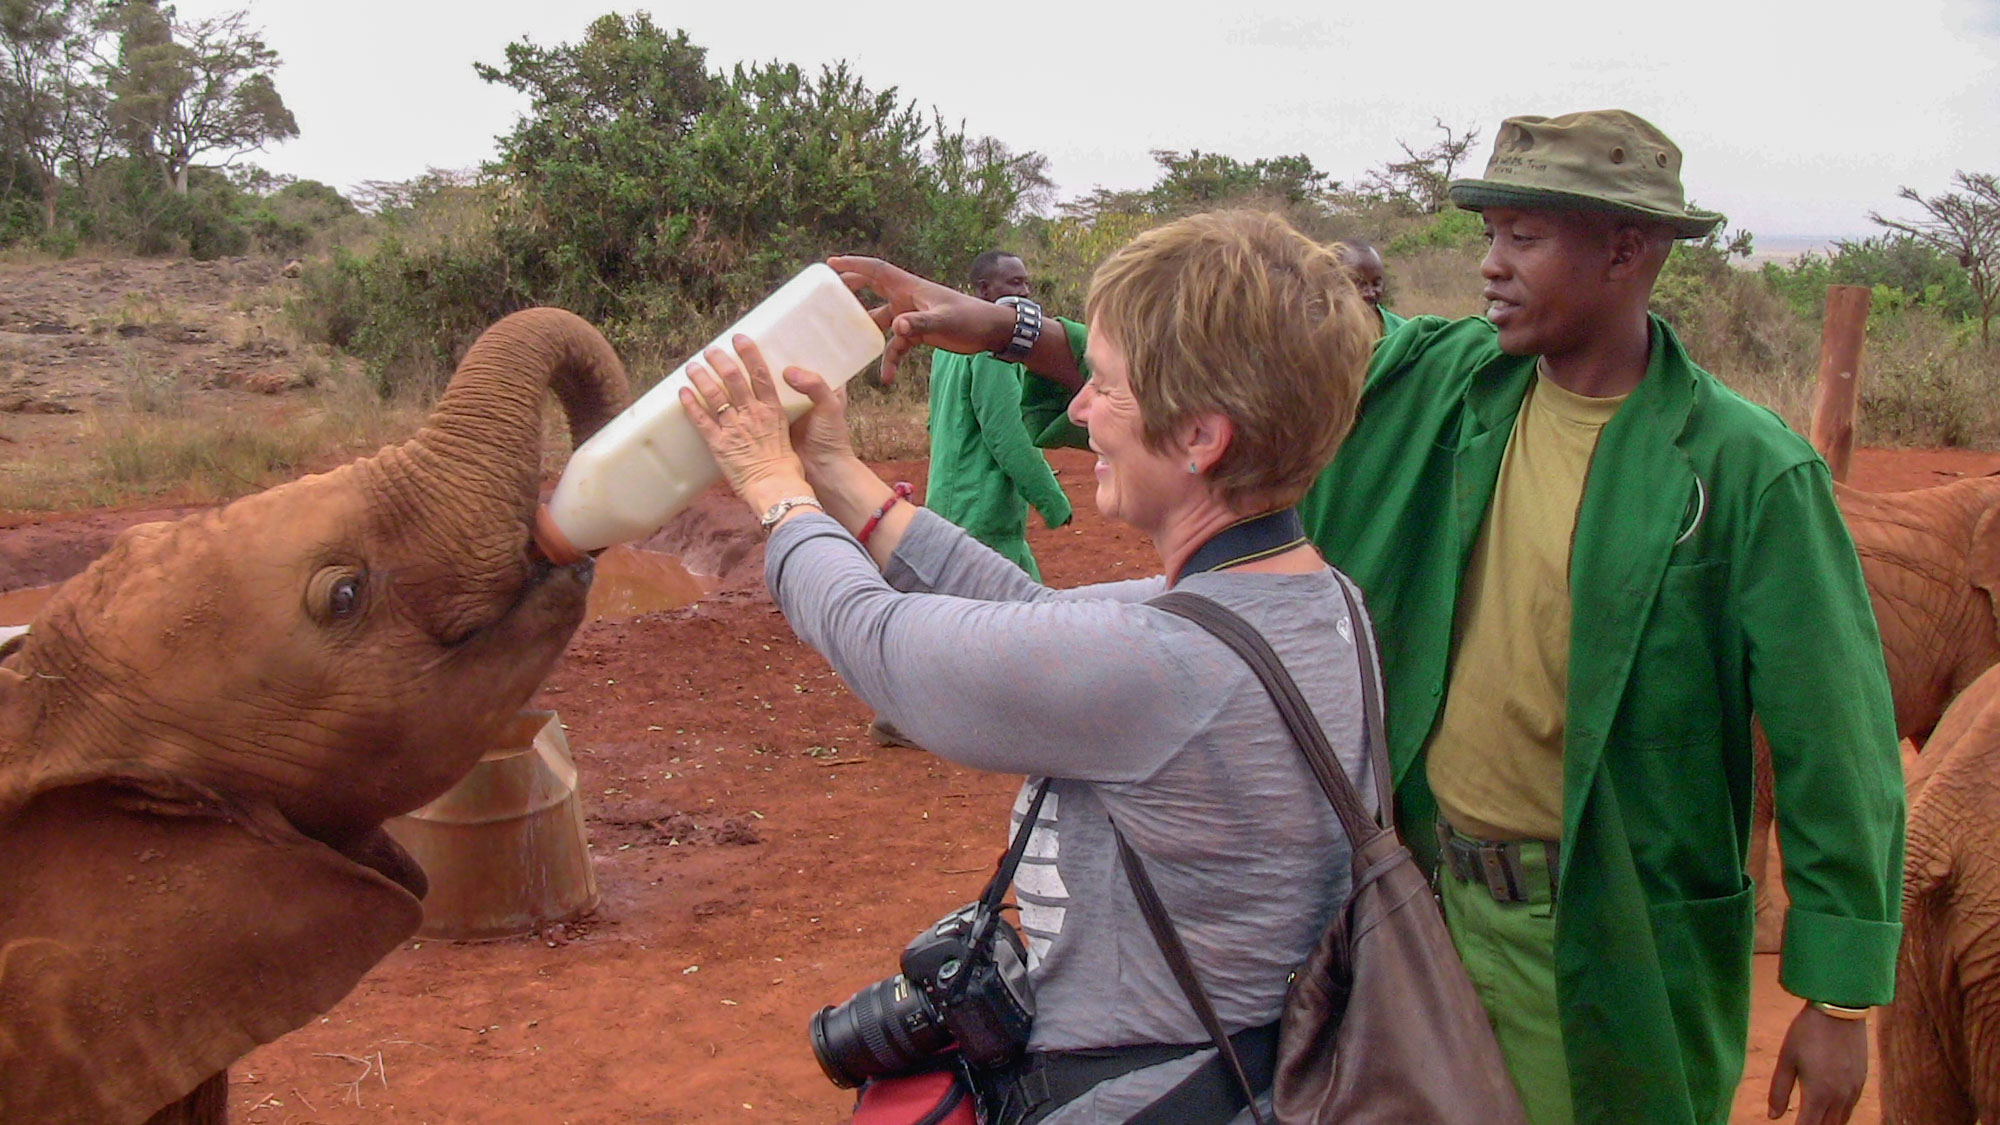 Kathy bottle feeding